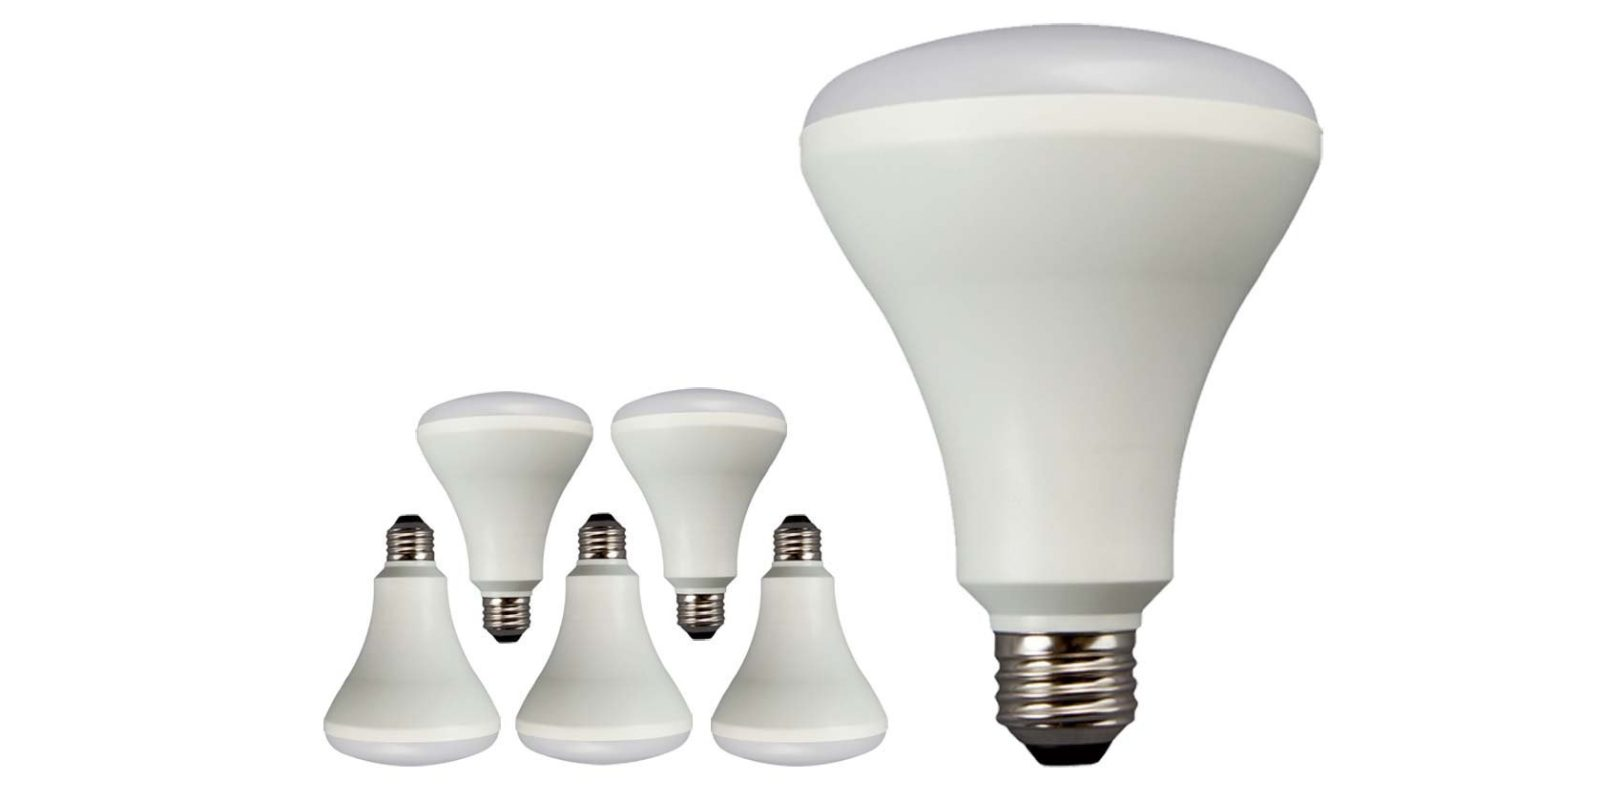 Uber Vehicle List >> Green Deals: TCP 6-pack 65W BR30 LED Light Bulbs $17, more ...